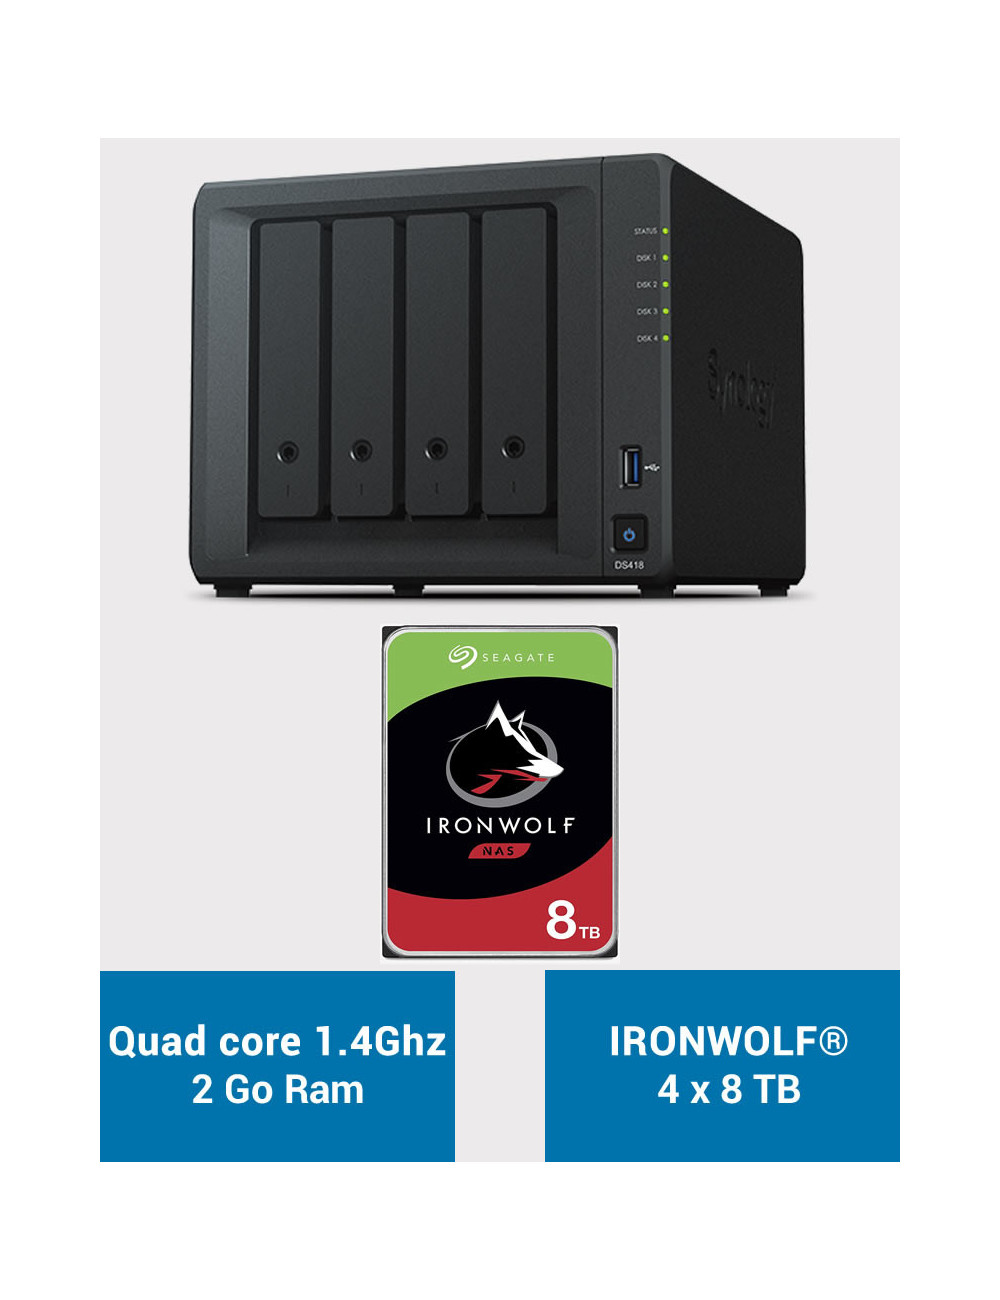 Synology DS418 NAS Server IRONWOLF 32TB (4x8TB)